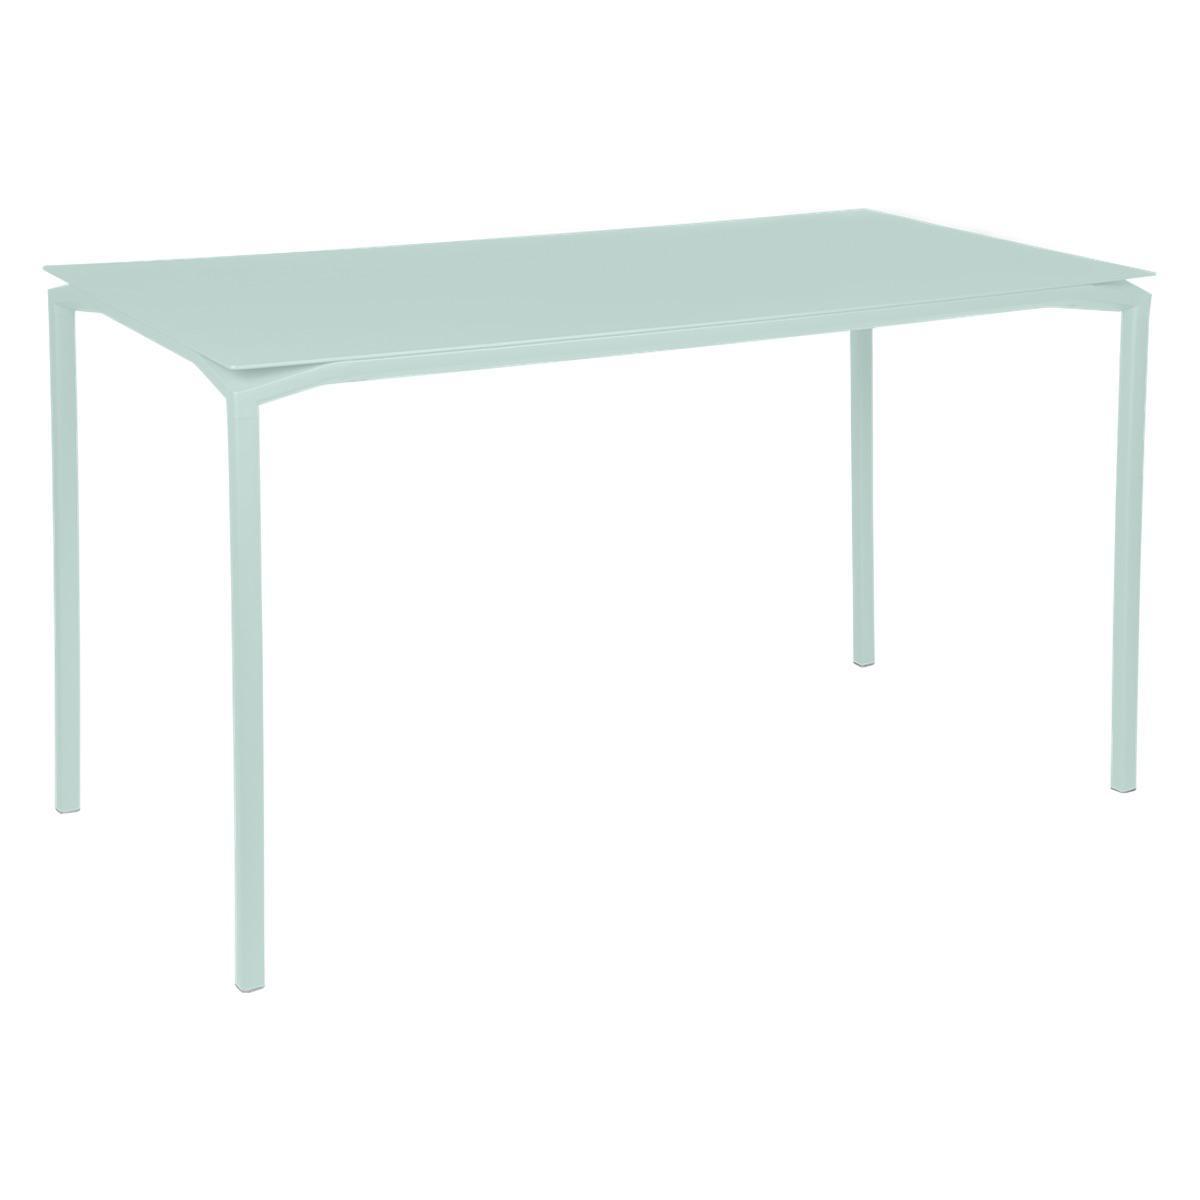 Table 80x160cm CALVI Fermob menthe glaciale